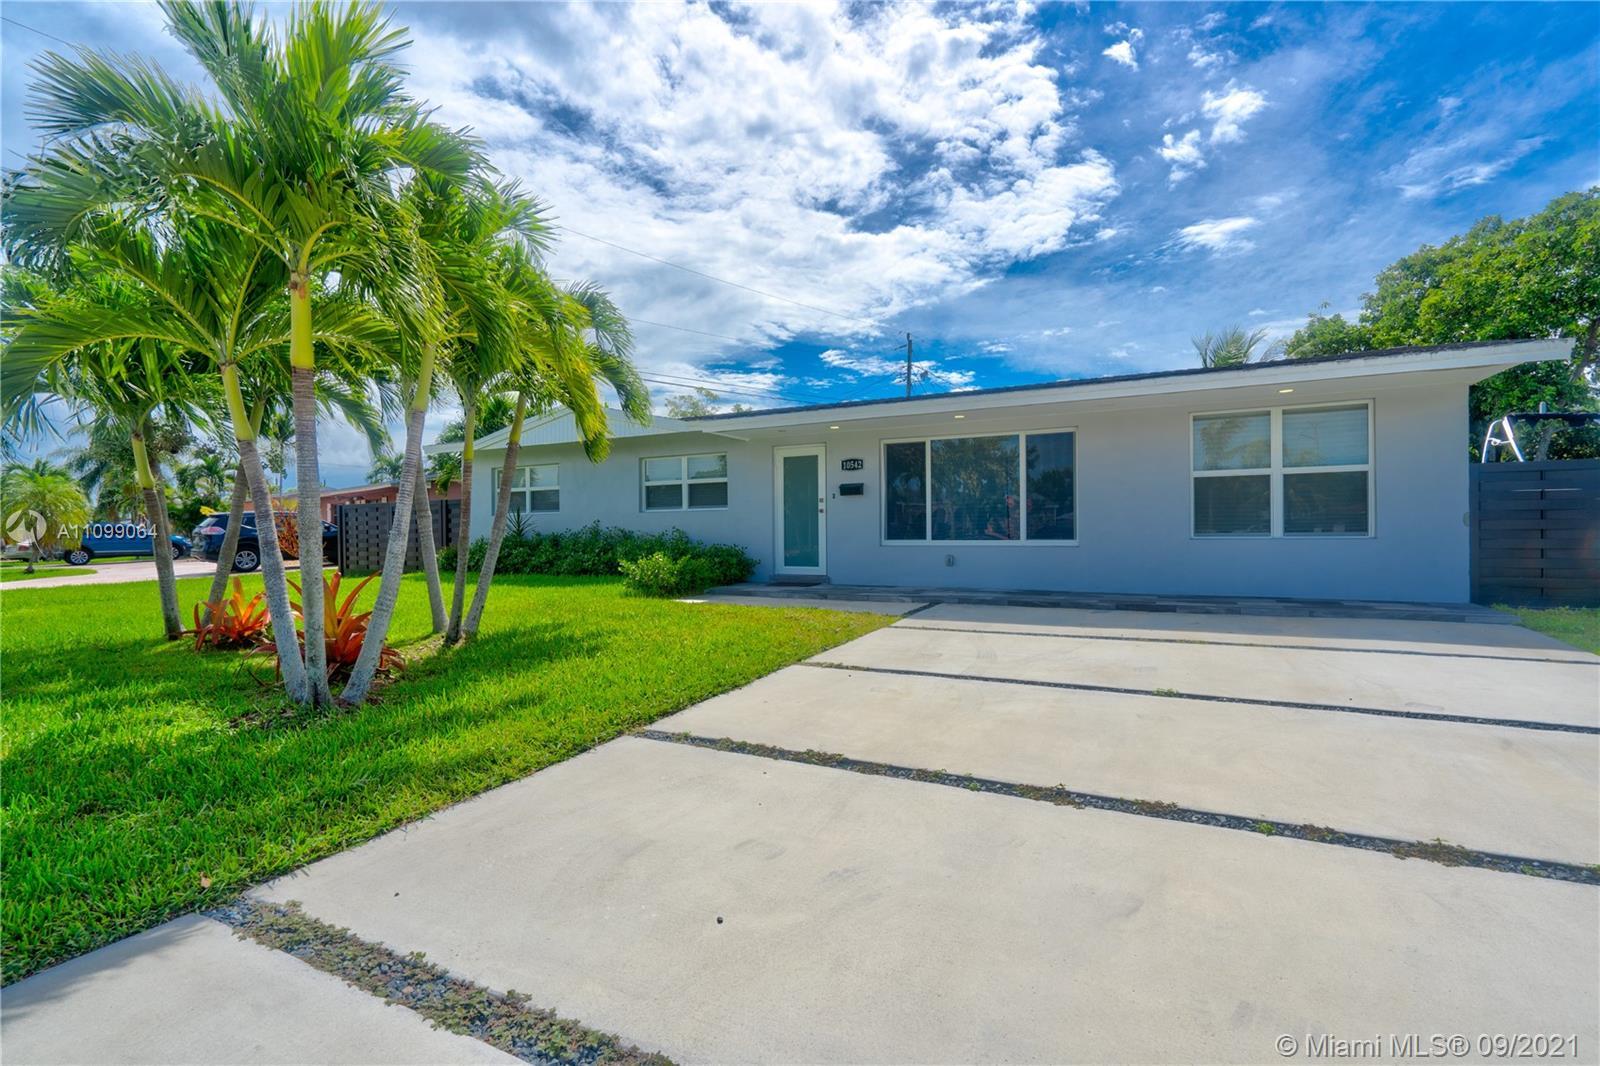 Heftler Homes - 10542 SW 50th St, Miami, FL 33165